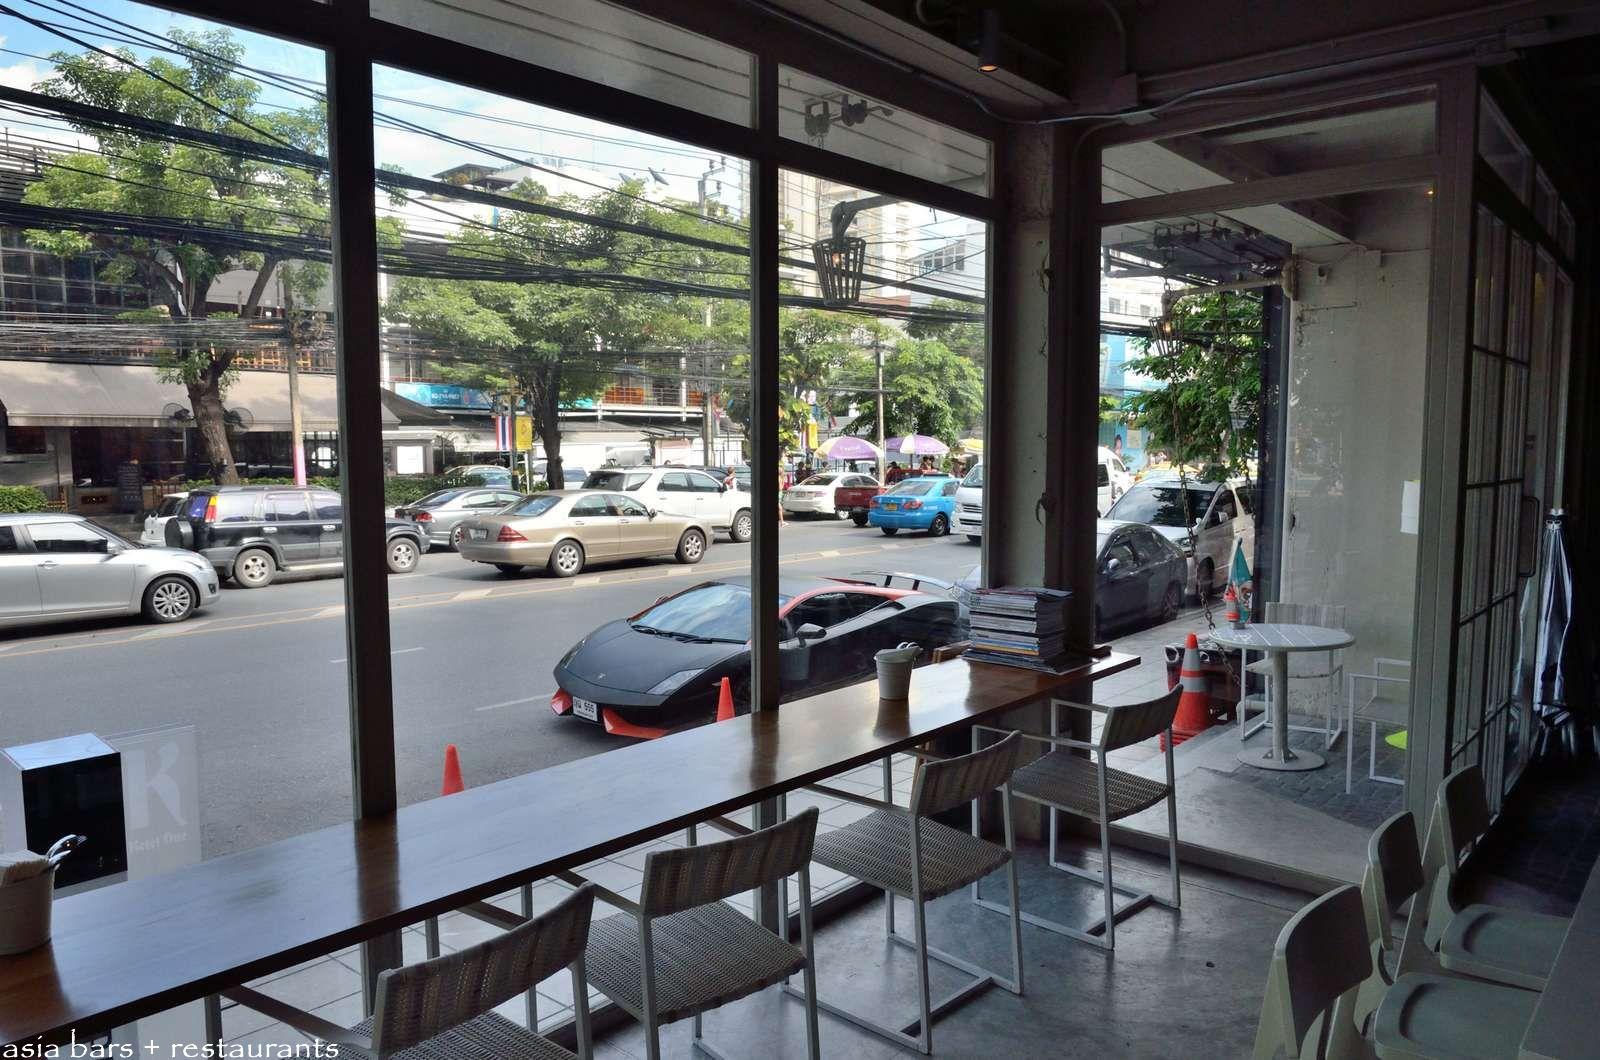 Badmotel Restaurant Amp Bar Modern Thai Street Food